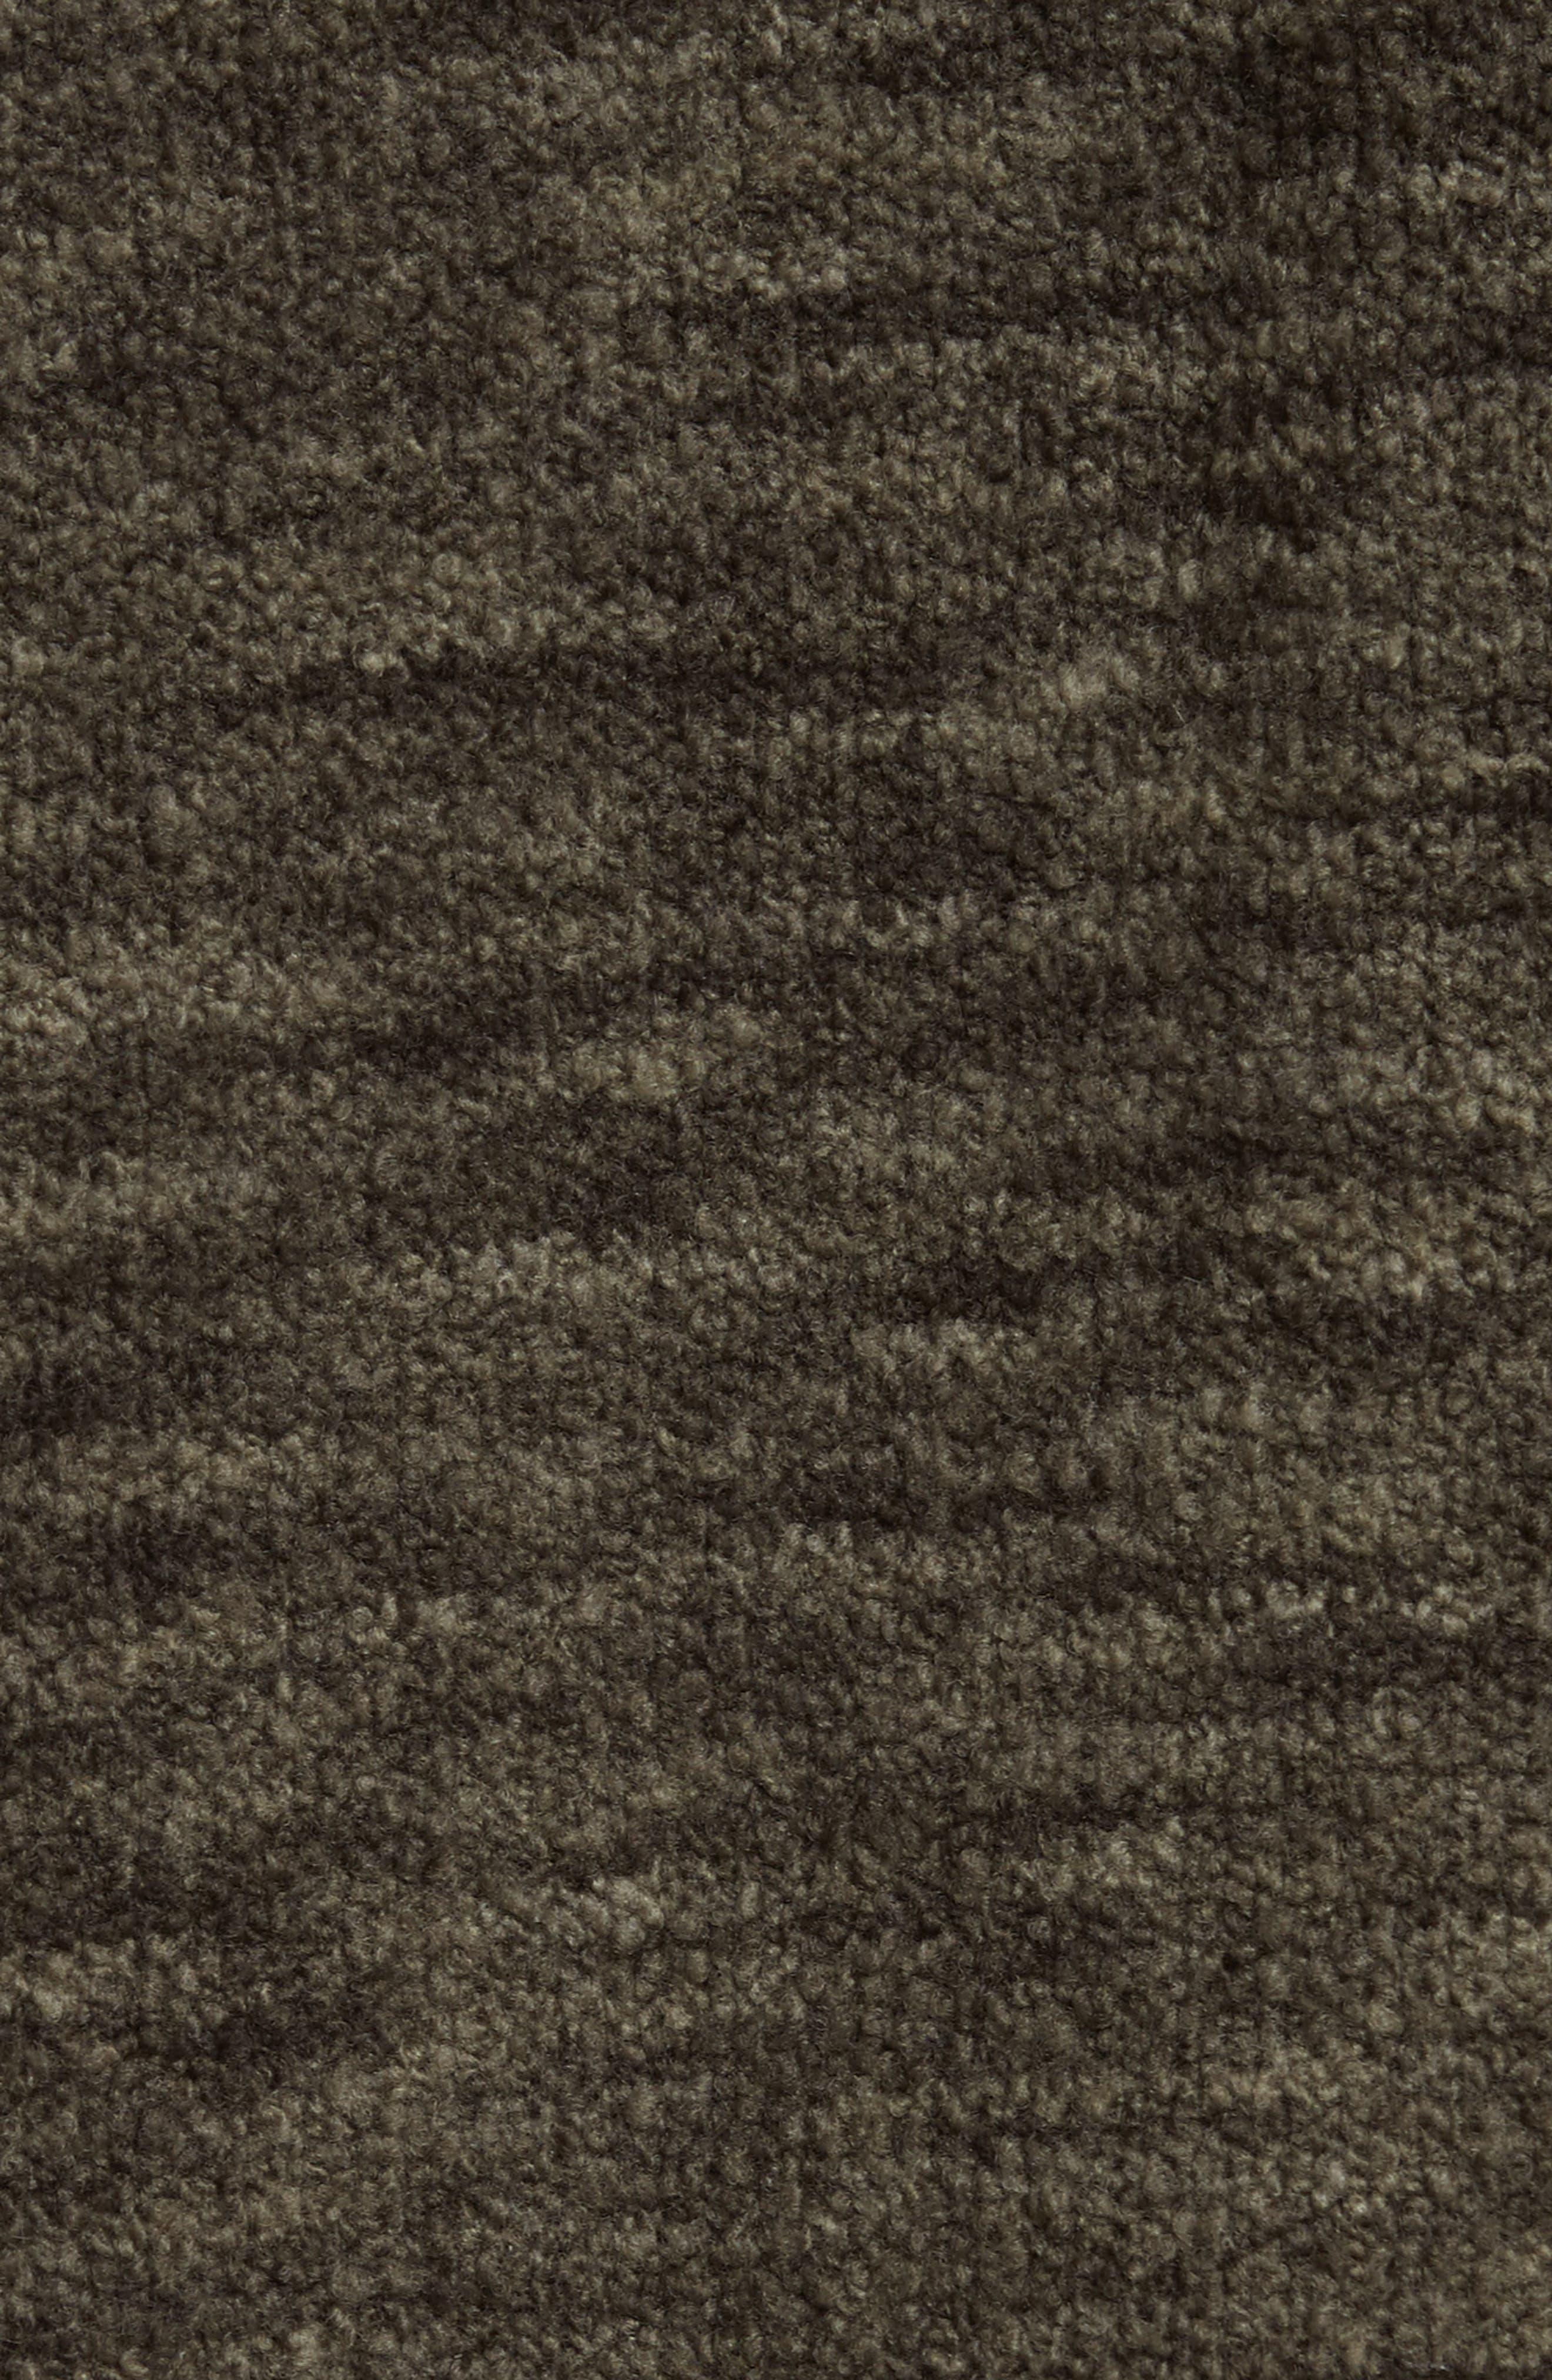 Space Dye Hoodie Sweater,                             Alternate thumbnail 5, color,                             343